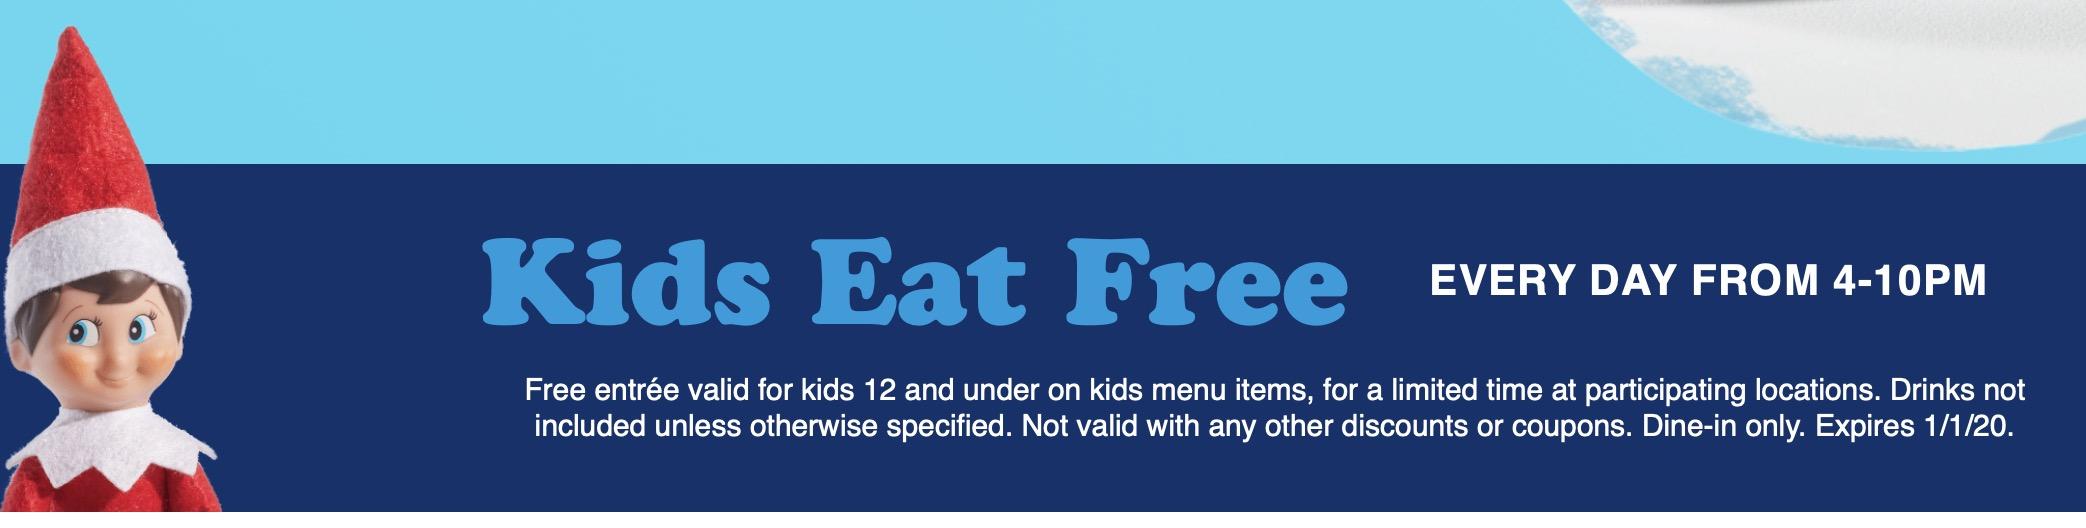 IHOP Kids Eat Free 2019 November Decemeber